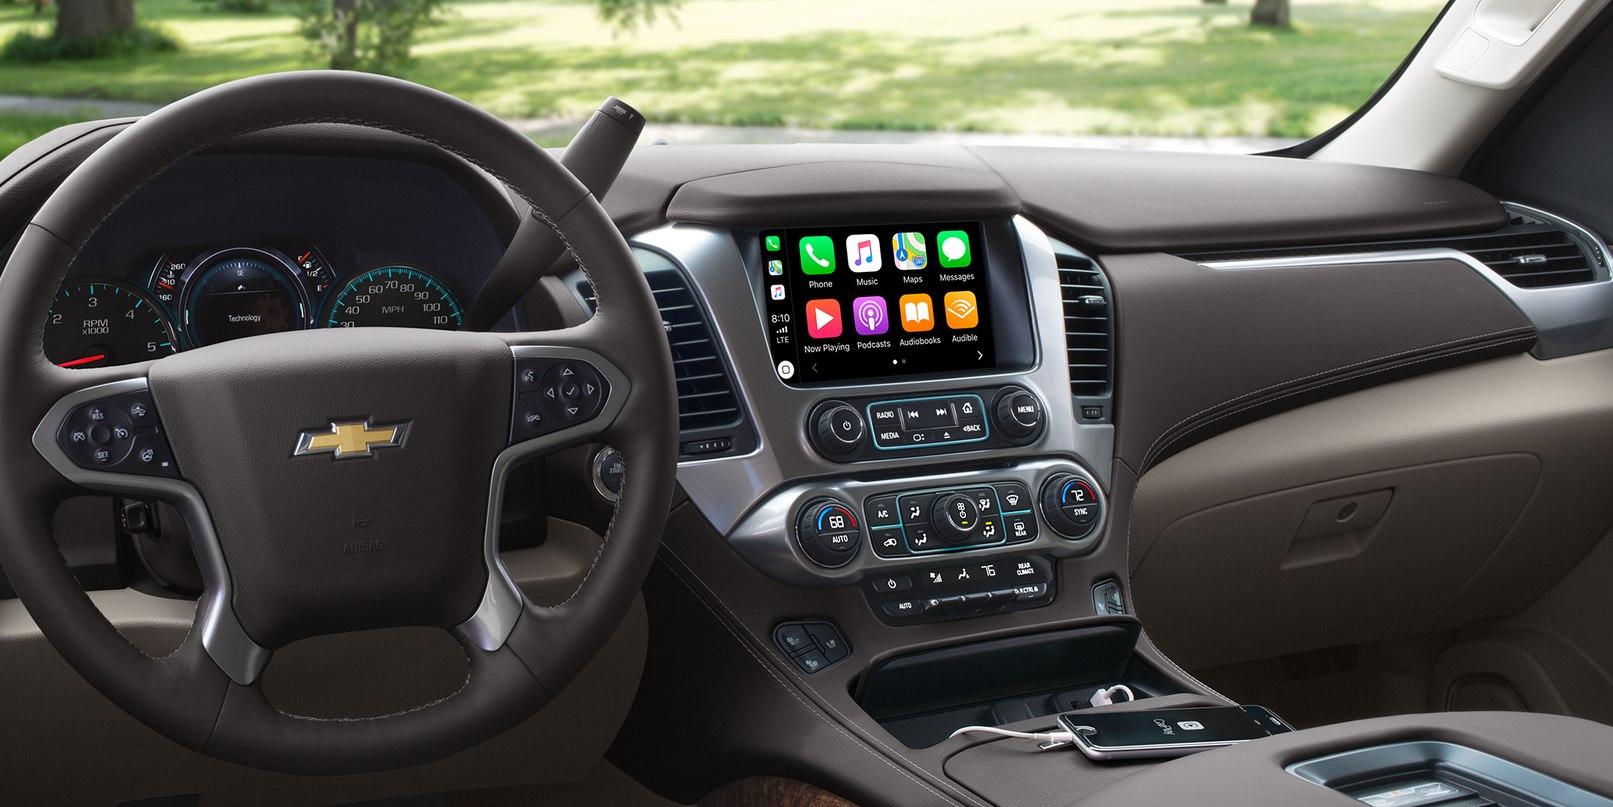 Multimedia Center in the 2019 Chevrolet Suburban